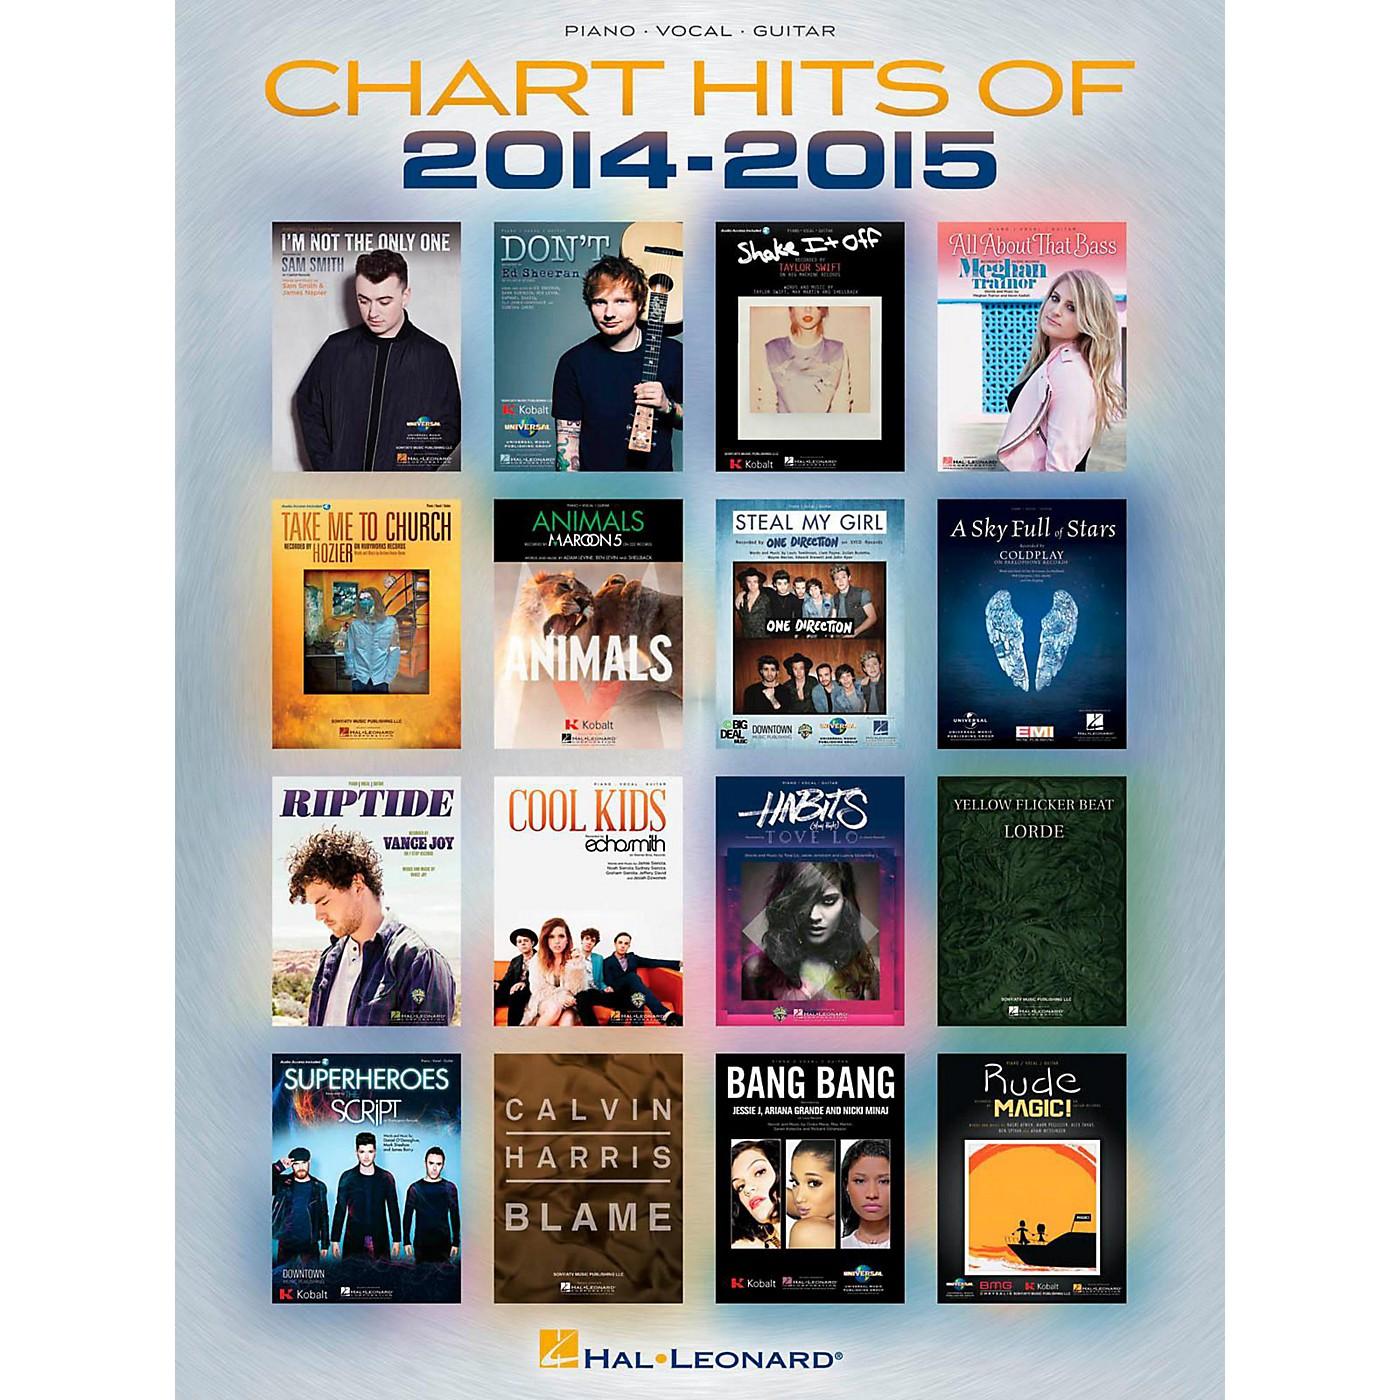 Hal Leonard Chart Hits of 2014-2015 Piano/Vocal/Guitar Songbook thumbnail